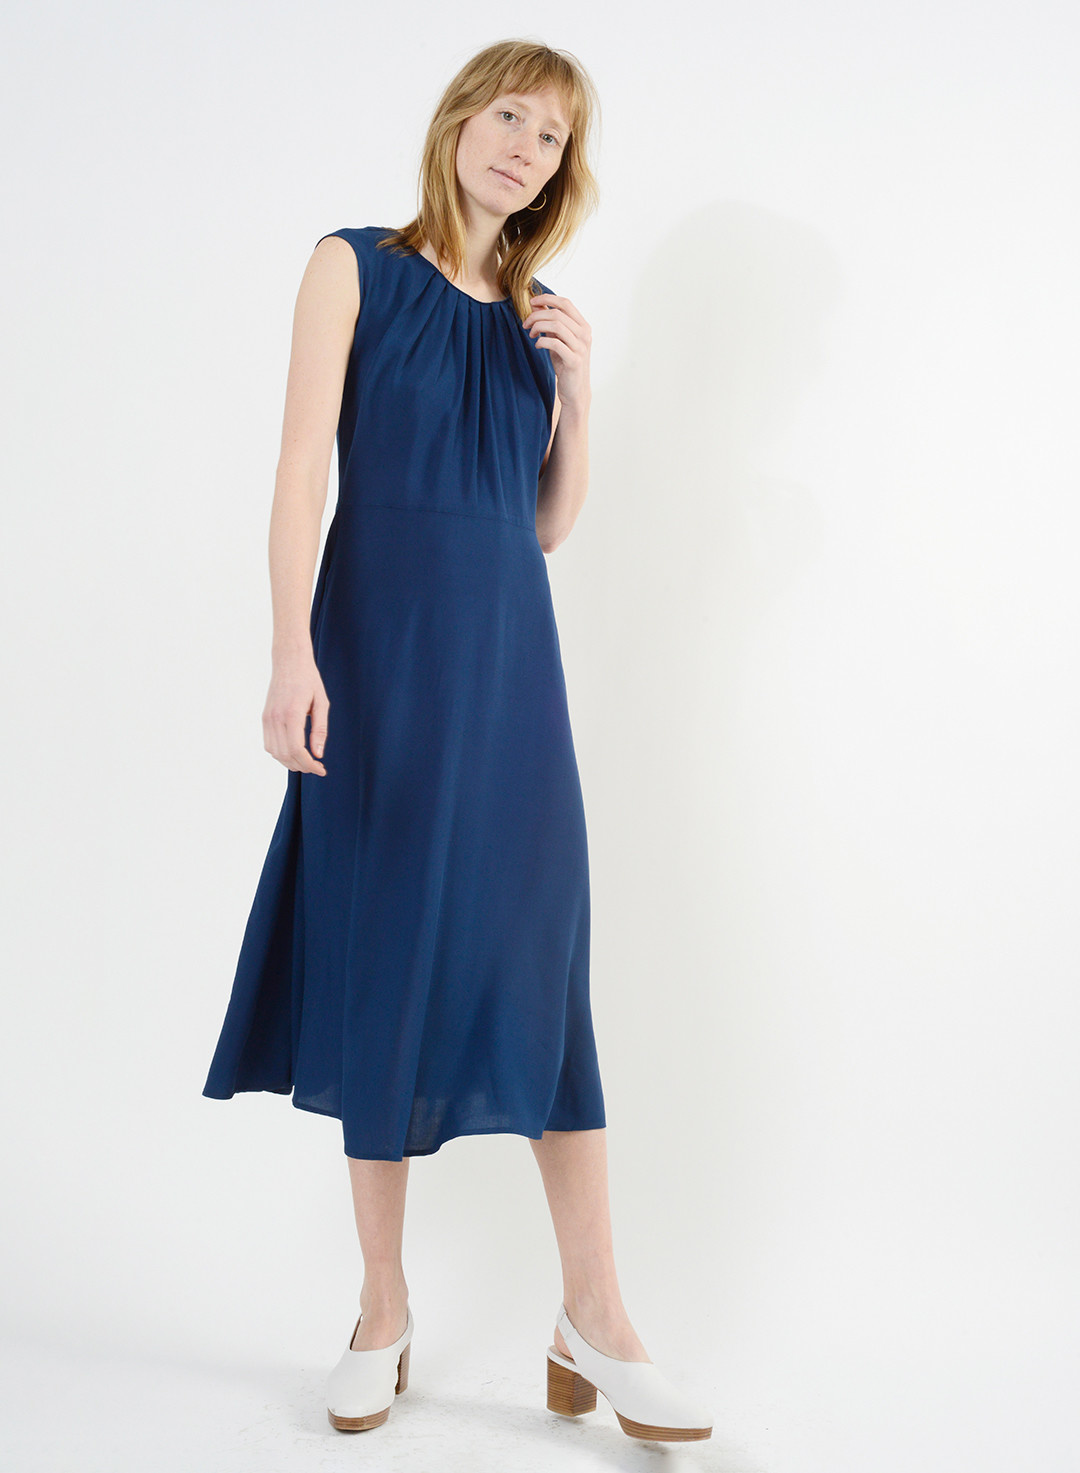 Floral Whitson Dress - Blue